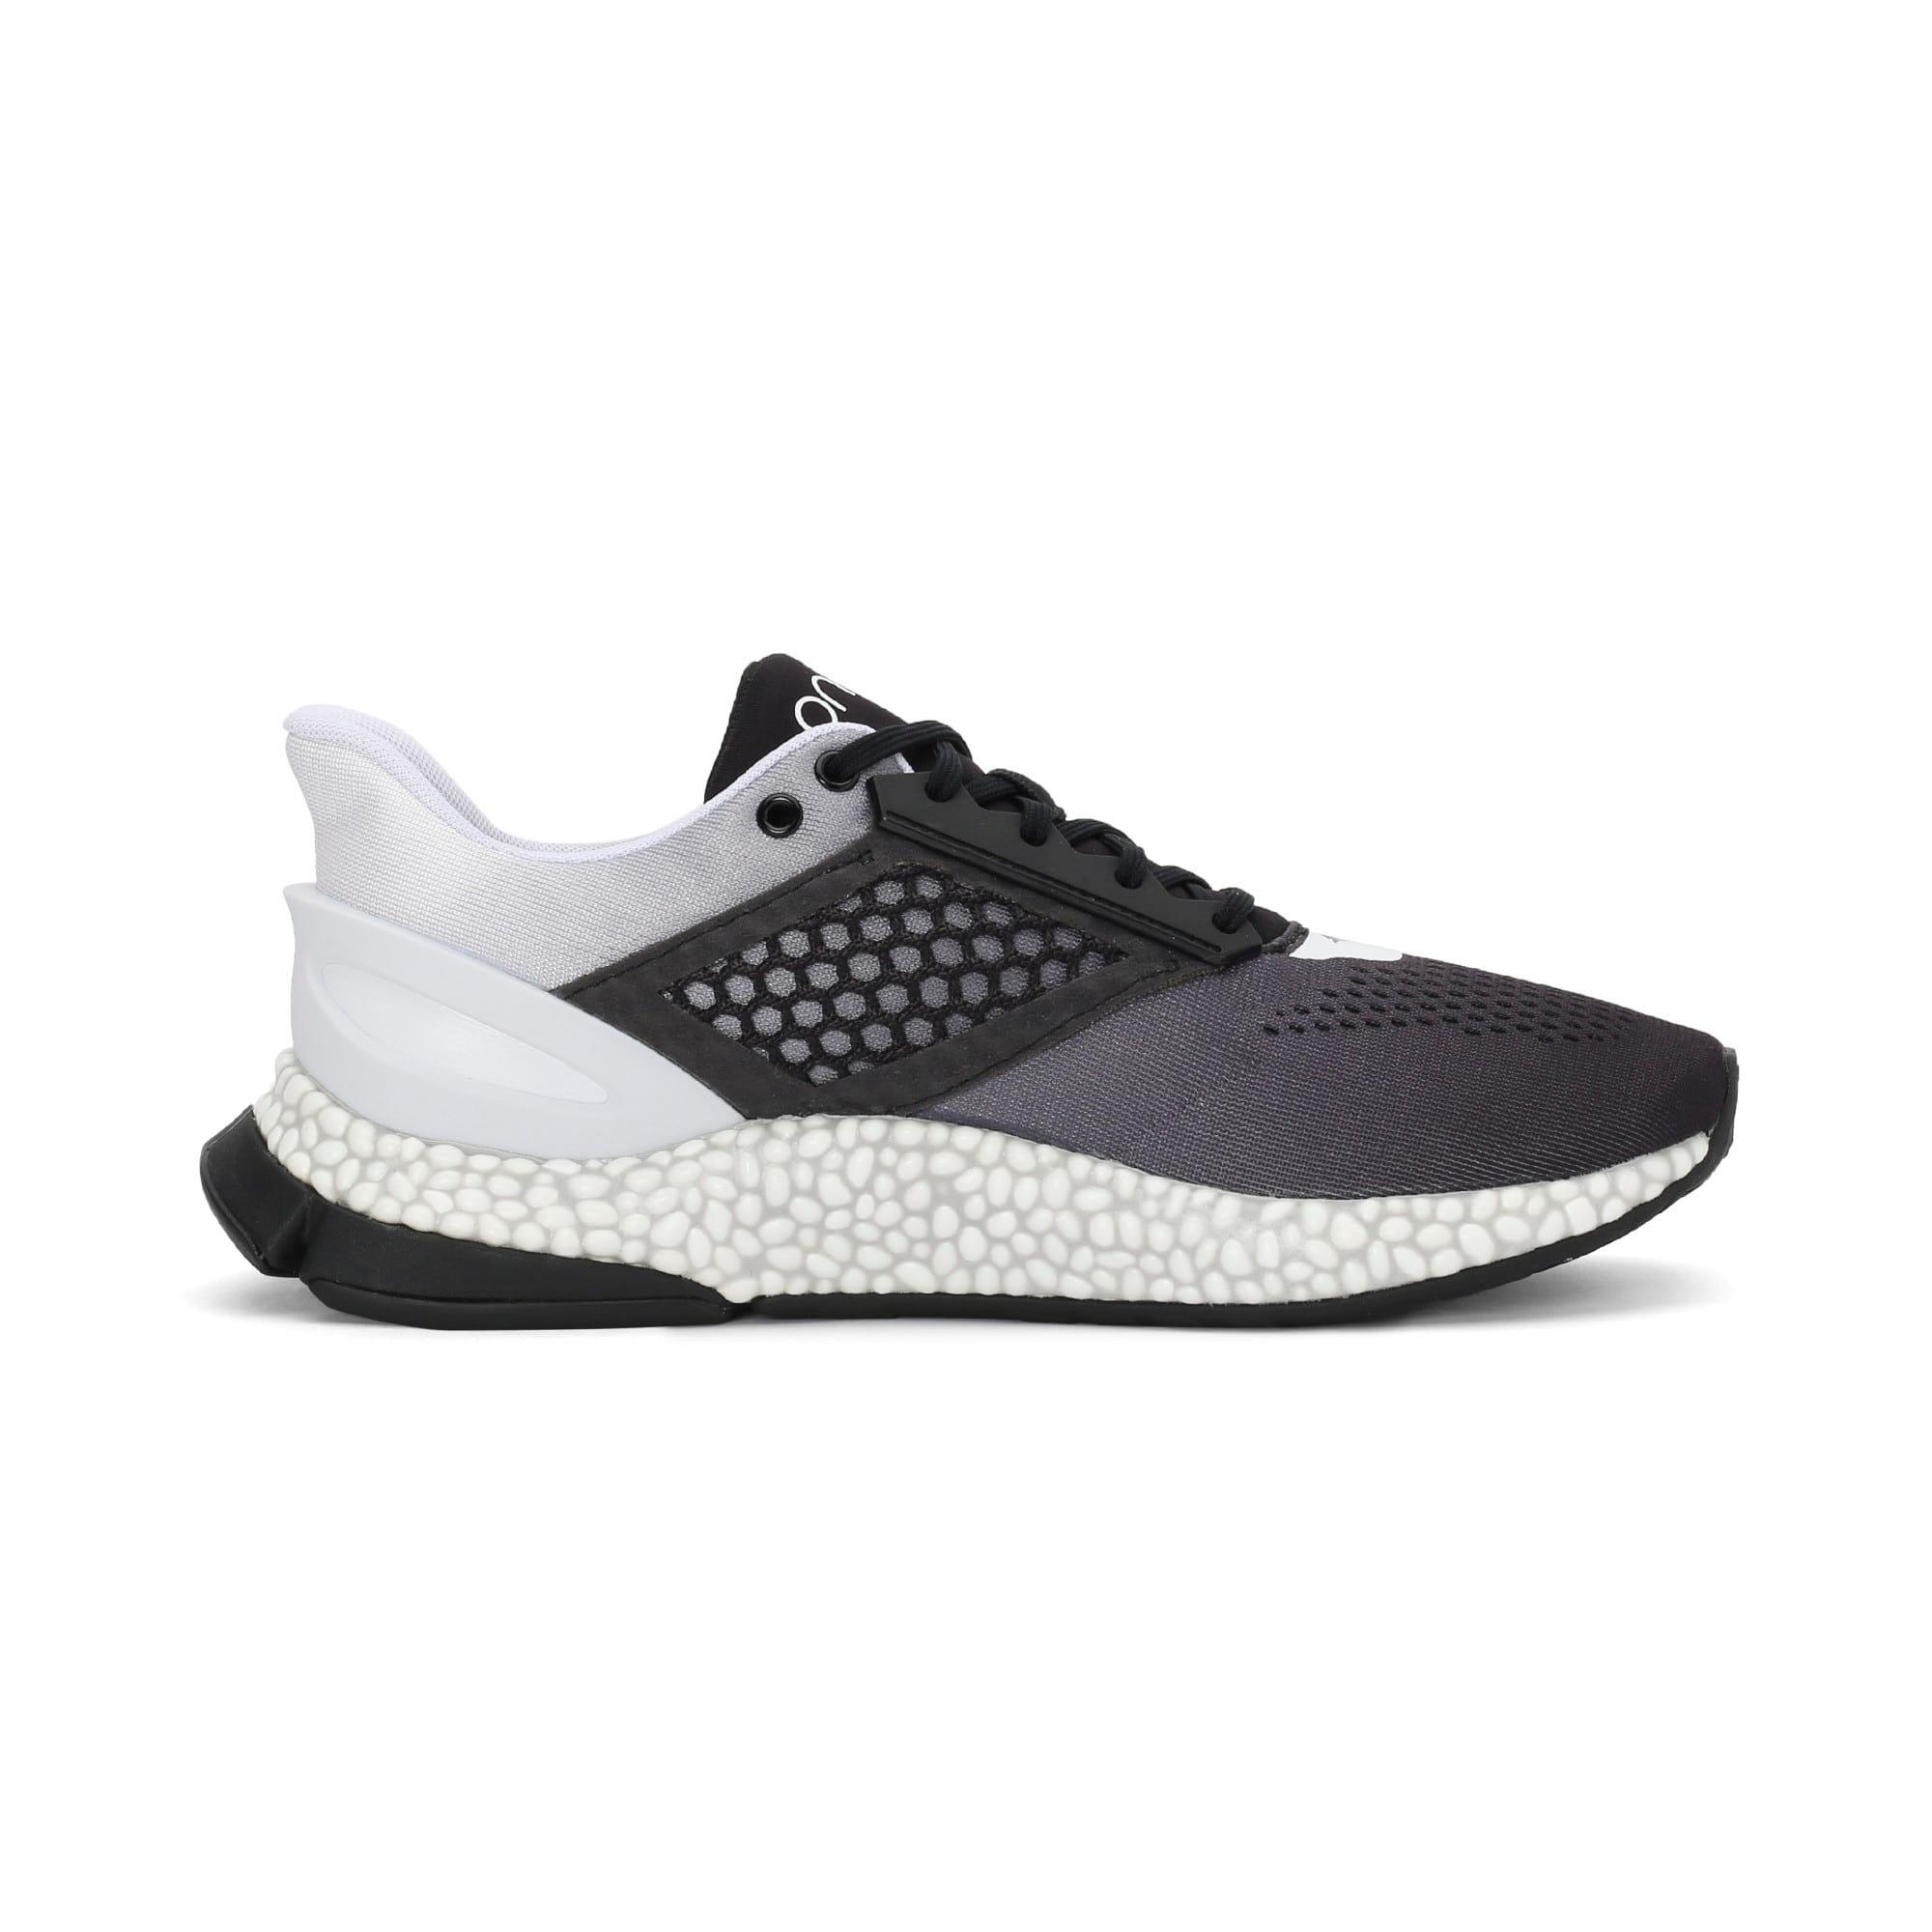 best website 2ffa1 7a306 HYBRID Astro one8 Unisex Running Shoes